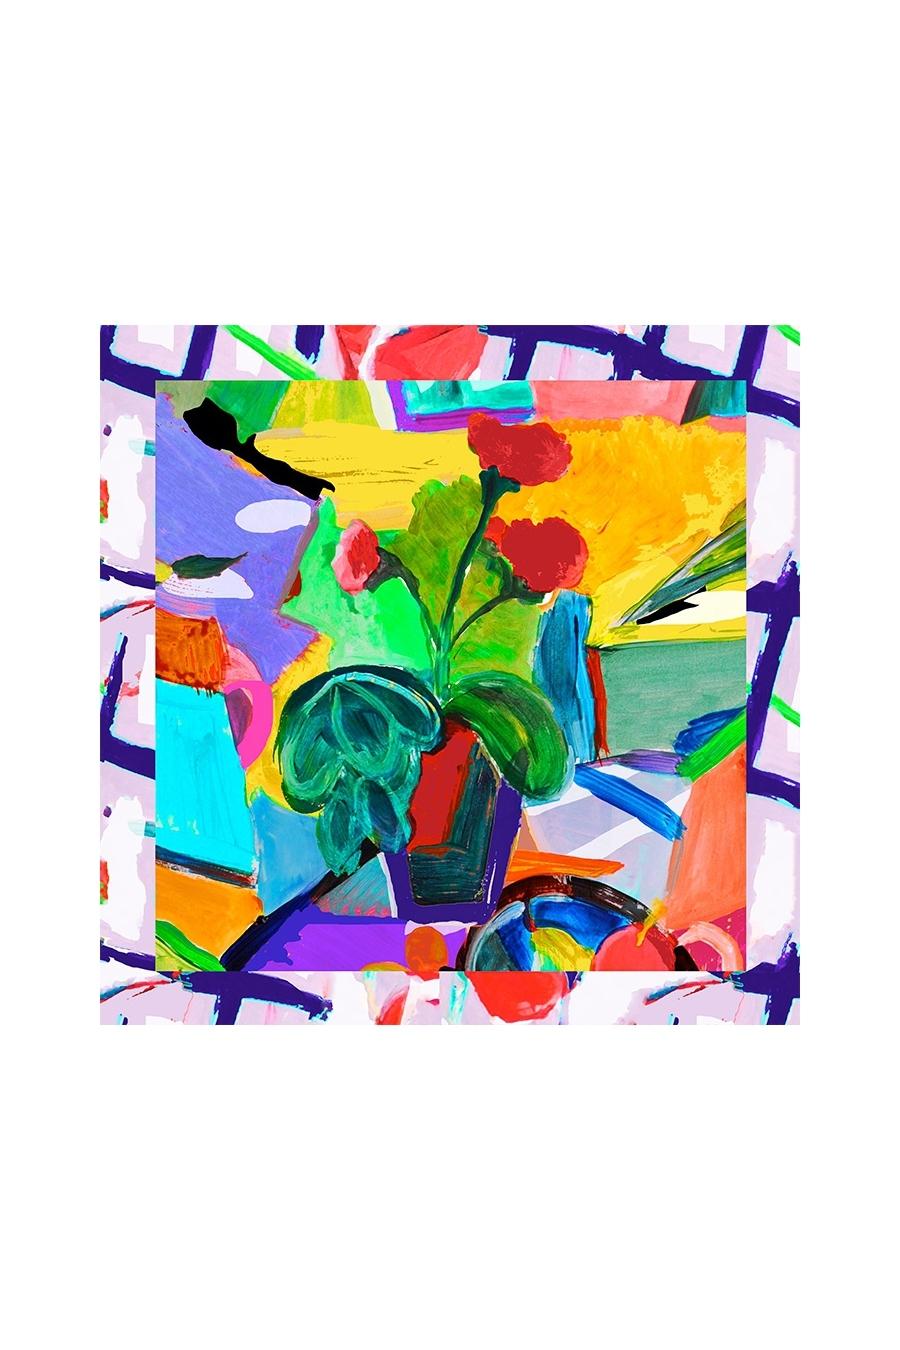 Maloka: Pink Isles Abstract Art Scarf (Many Art Patterns!)